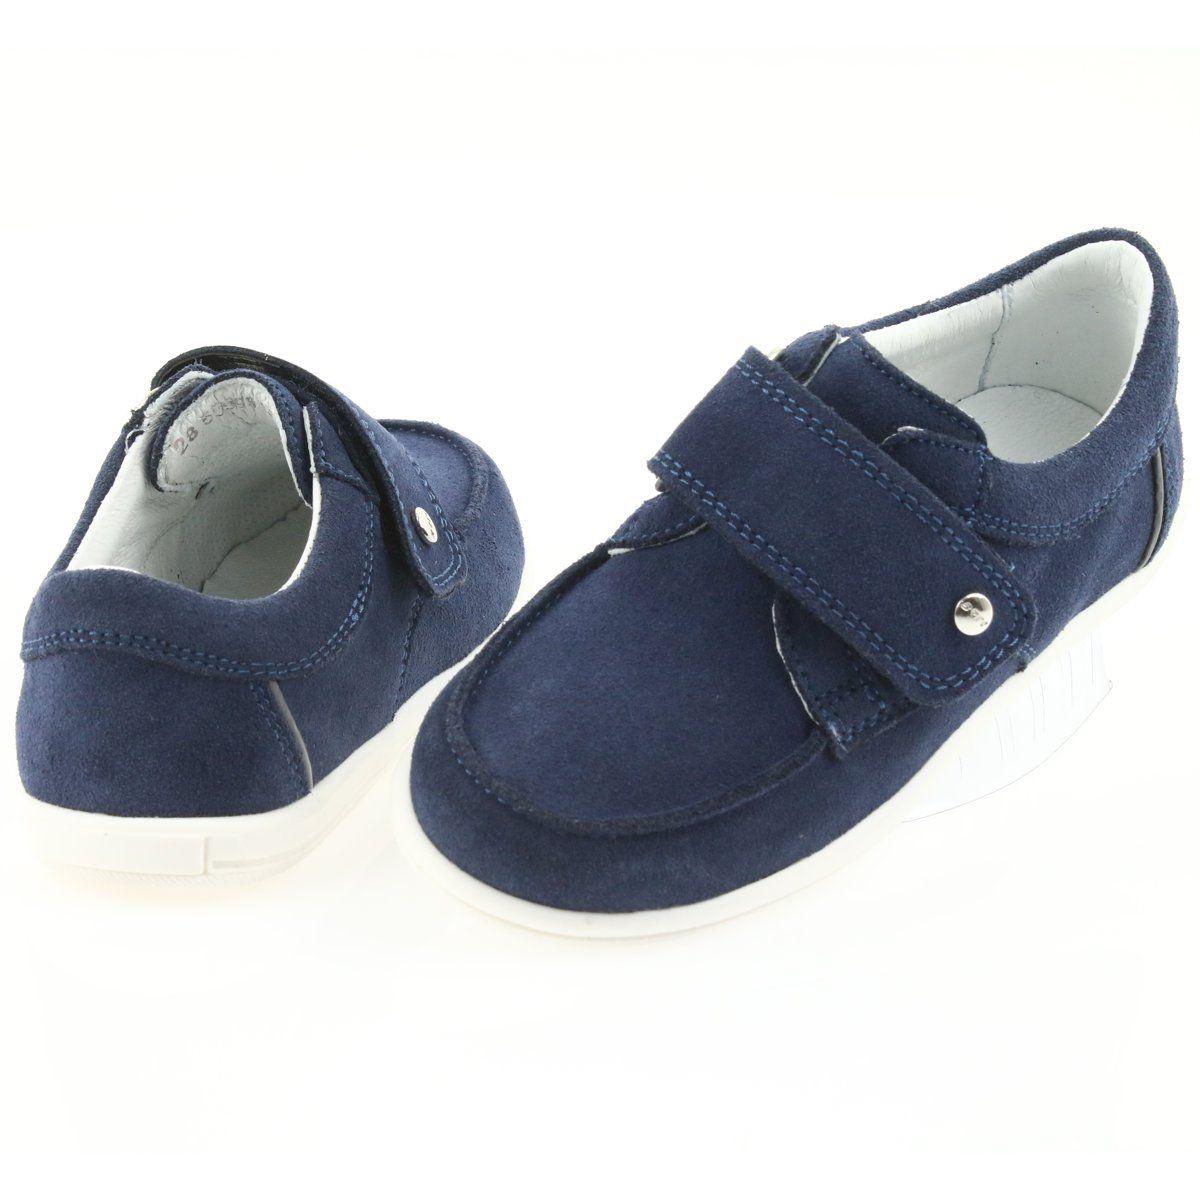 Bartek Polbuty Casualowe Chlopiece 55599 Granat Granatowe Boys Casual Shoes Childrens Shoes Shoes